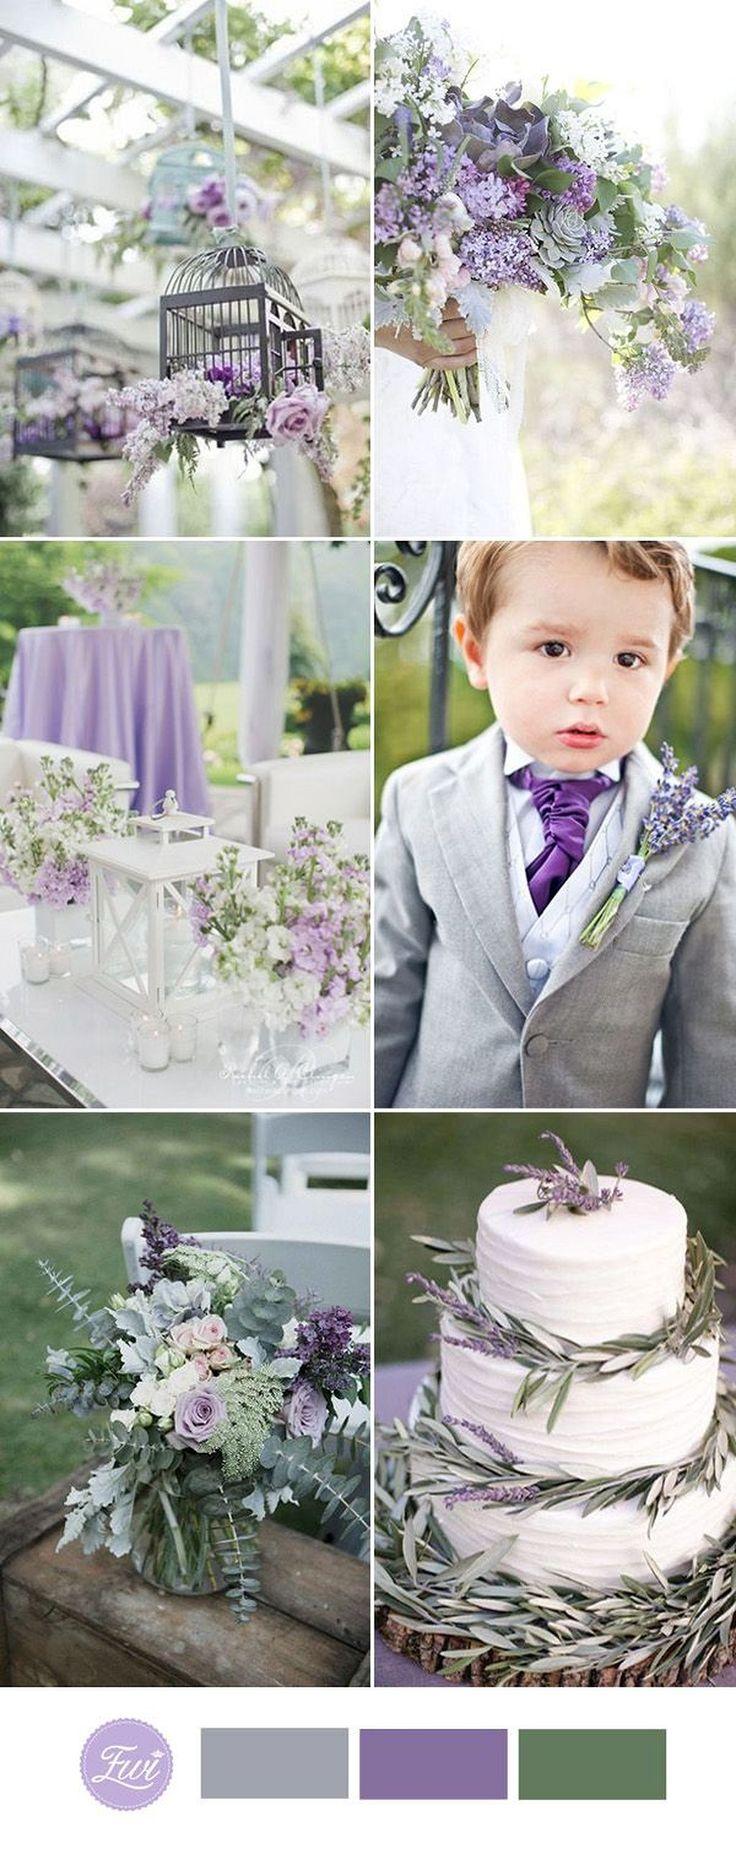 Amazing 68 Plum Purple and Grey Elegant Wedding Color Ideas https://weddmagz.com/68-plum-purple-and-grey-elegant-wedding-color-ideas/